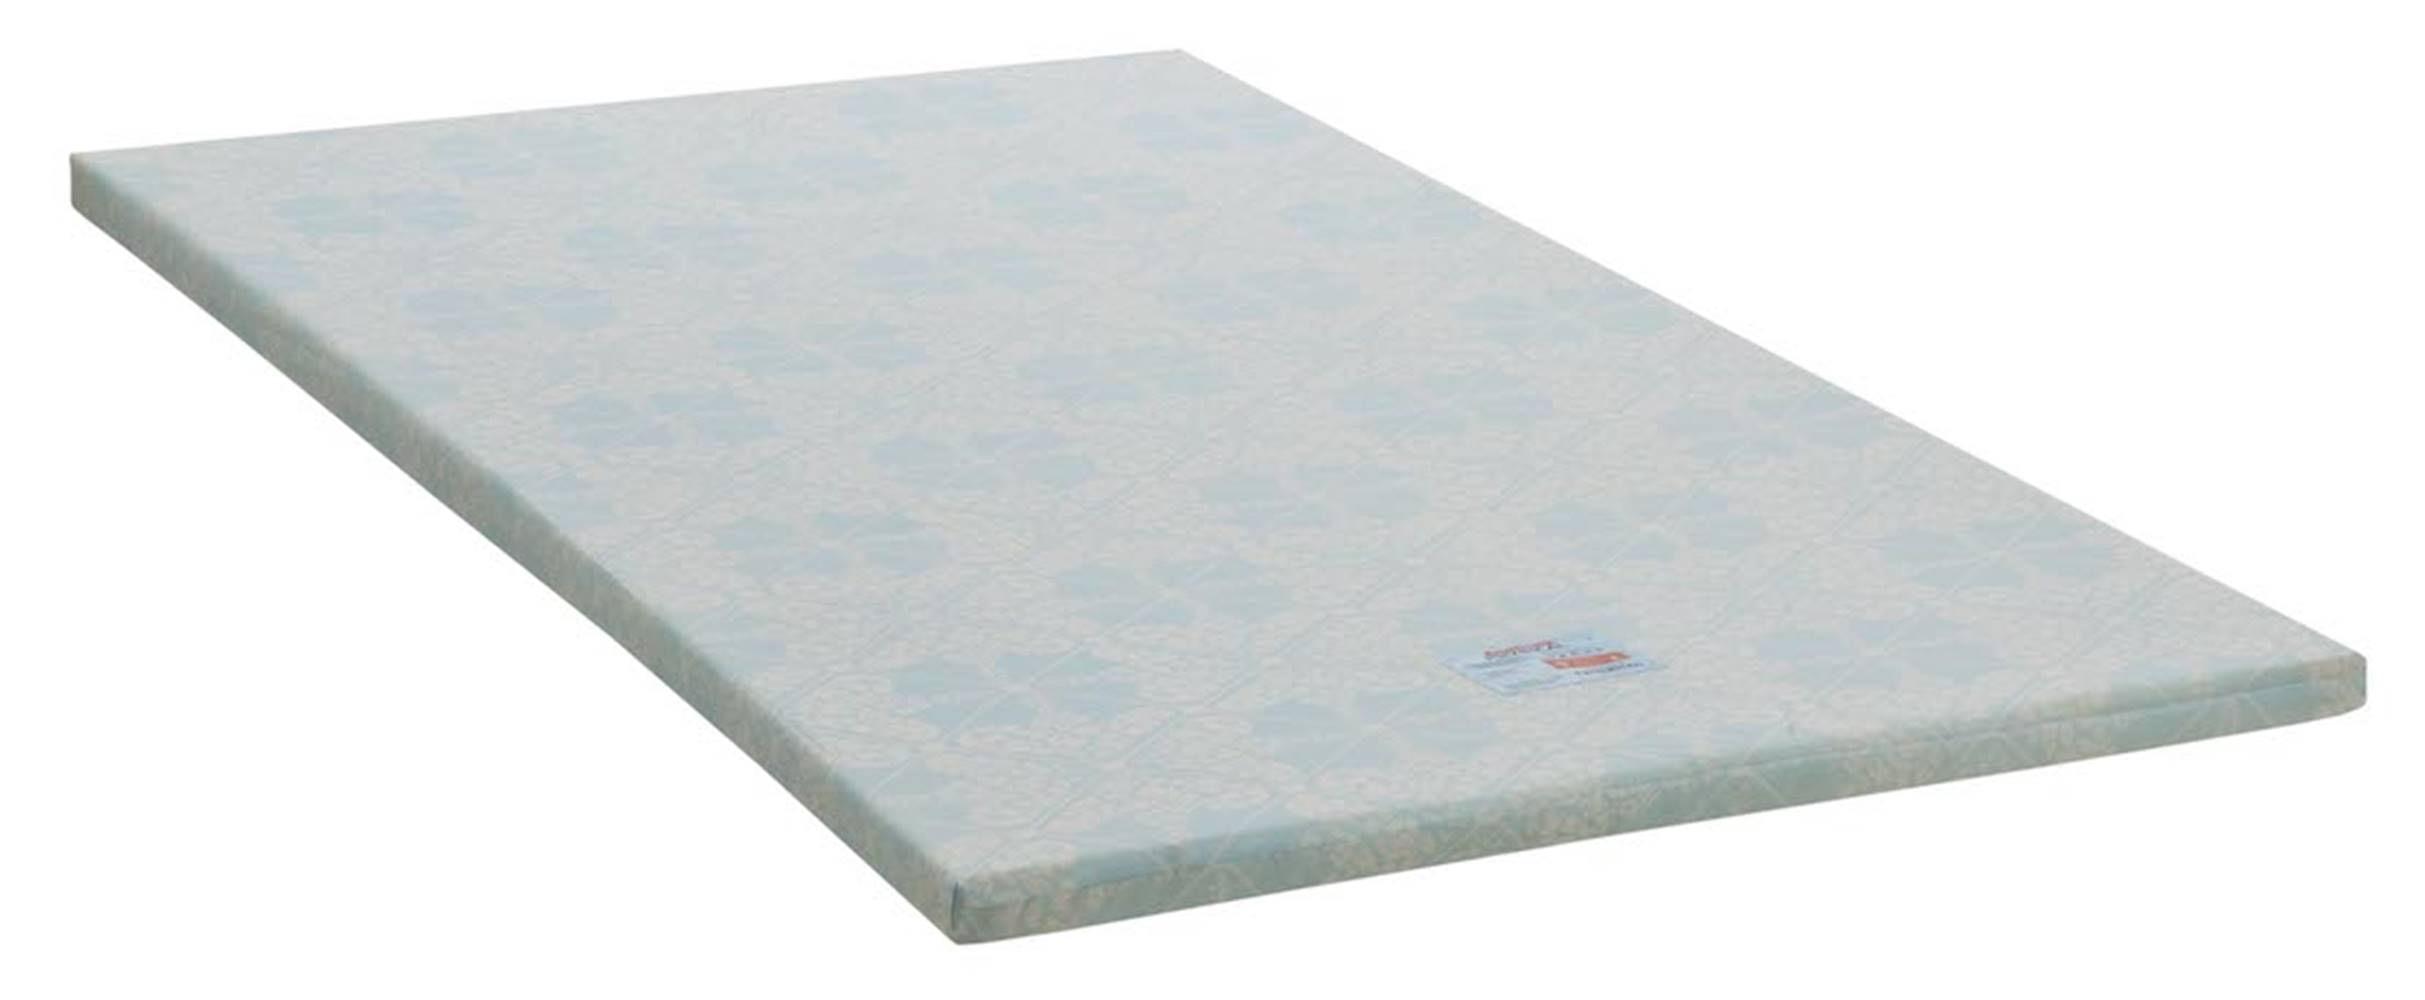 Colchonete Physical Baixo Solteiro 78 cm (LARG) Branco e Azul - 42946